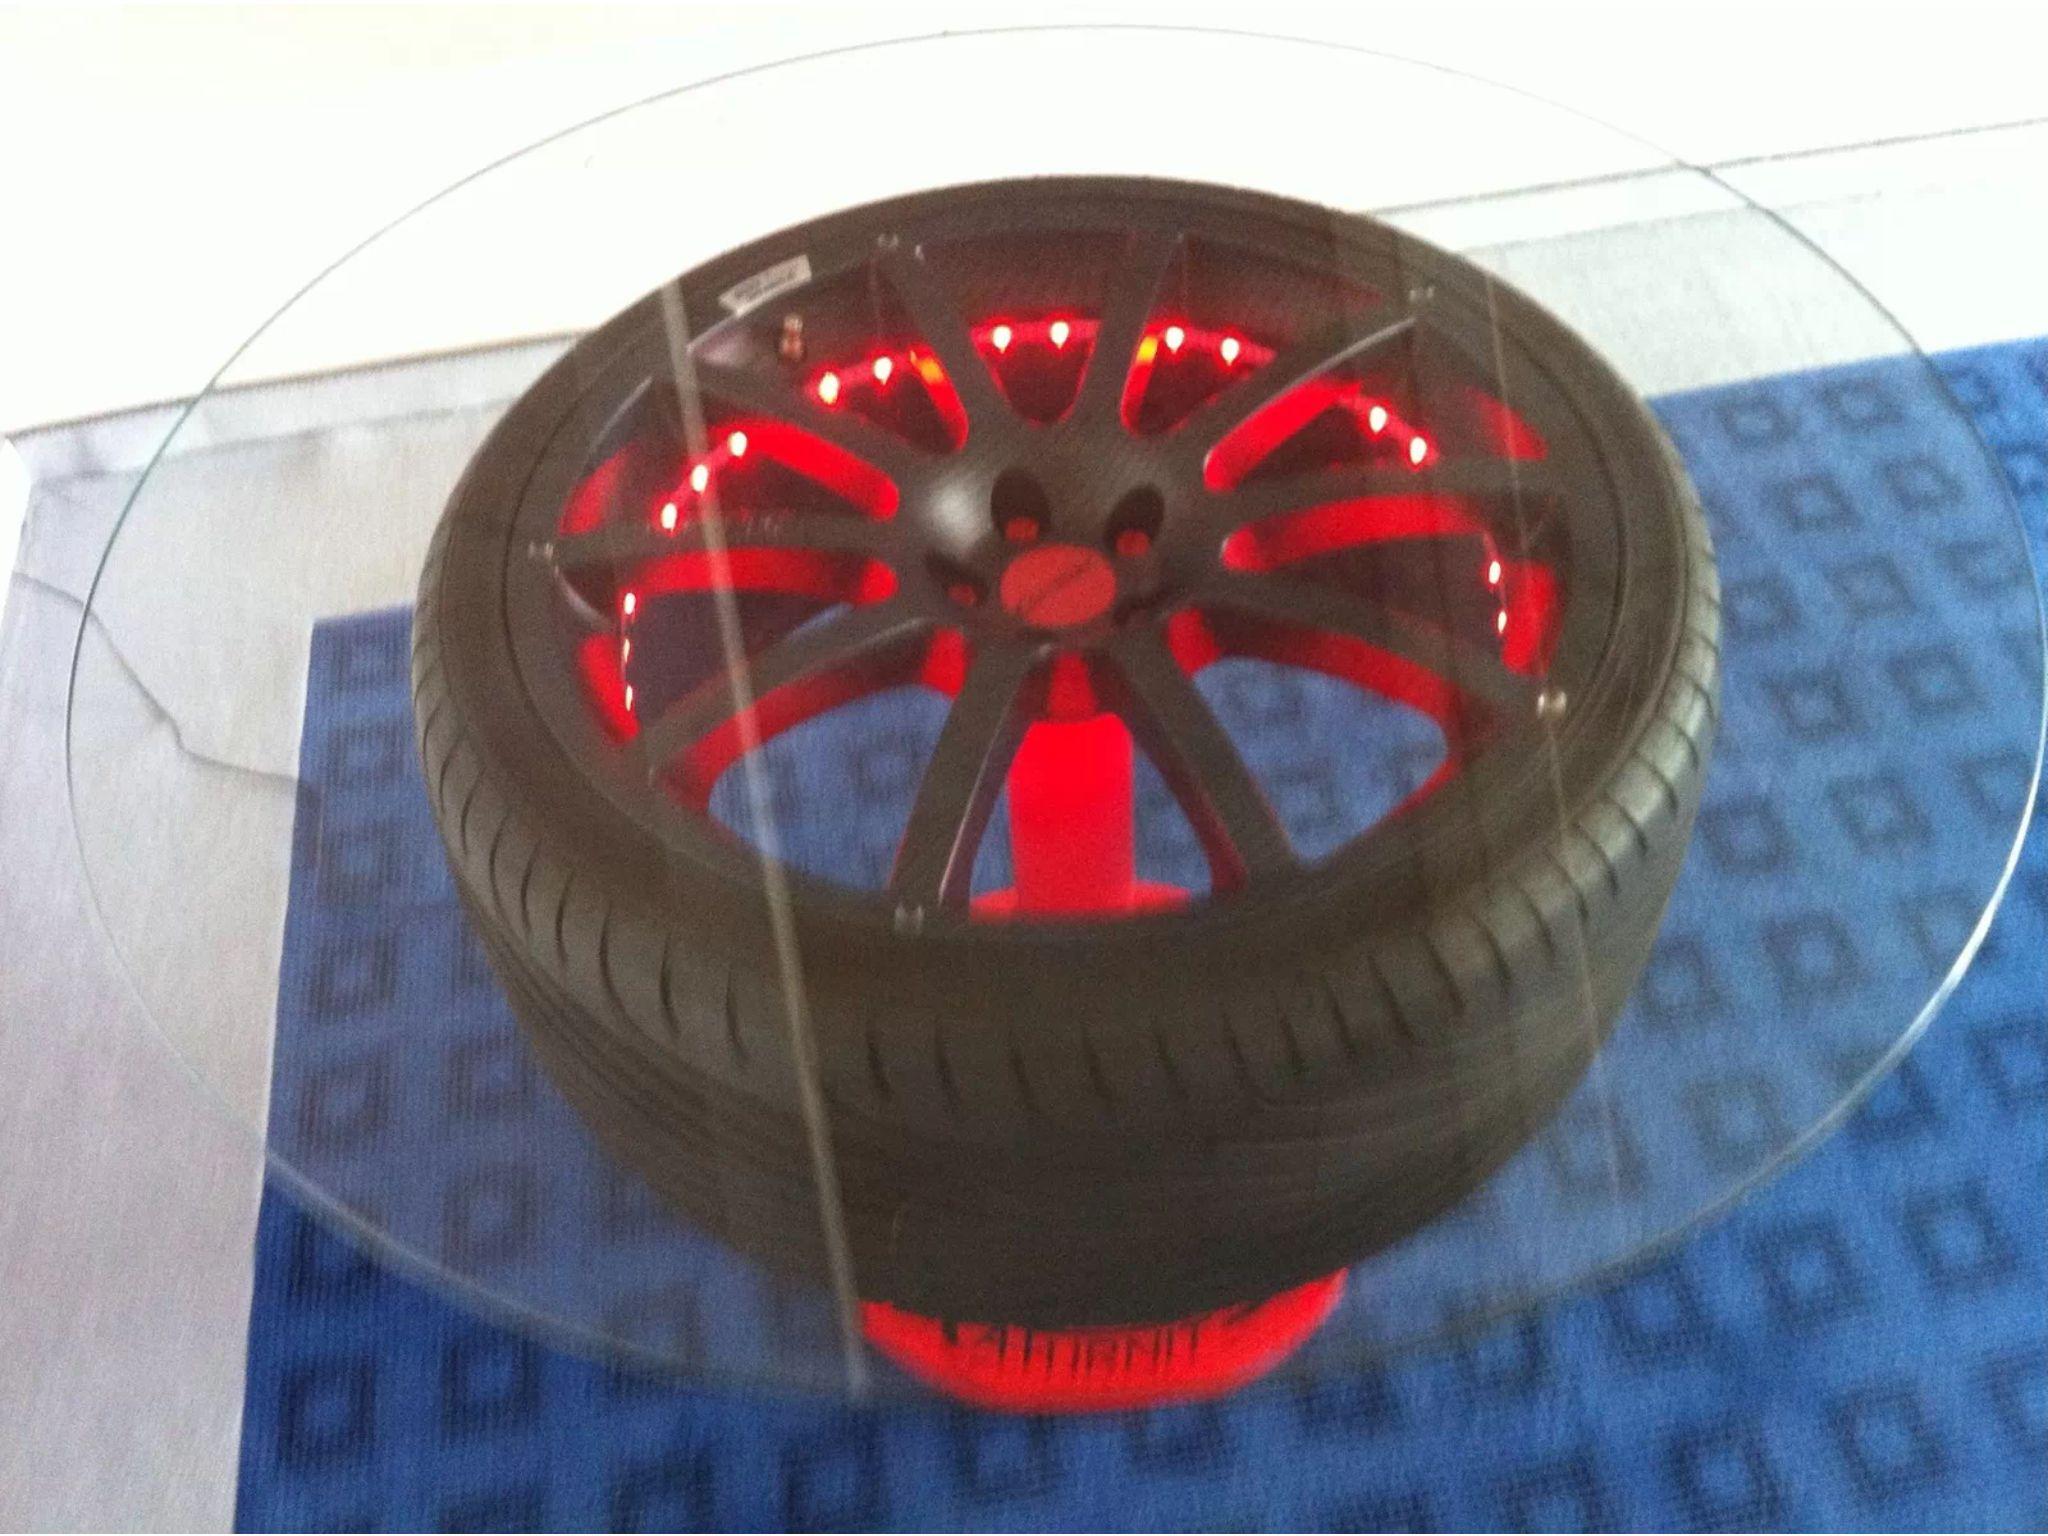 Felgentisch mit roter Beleuchtung   industrial lights   Pinterest ...